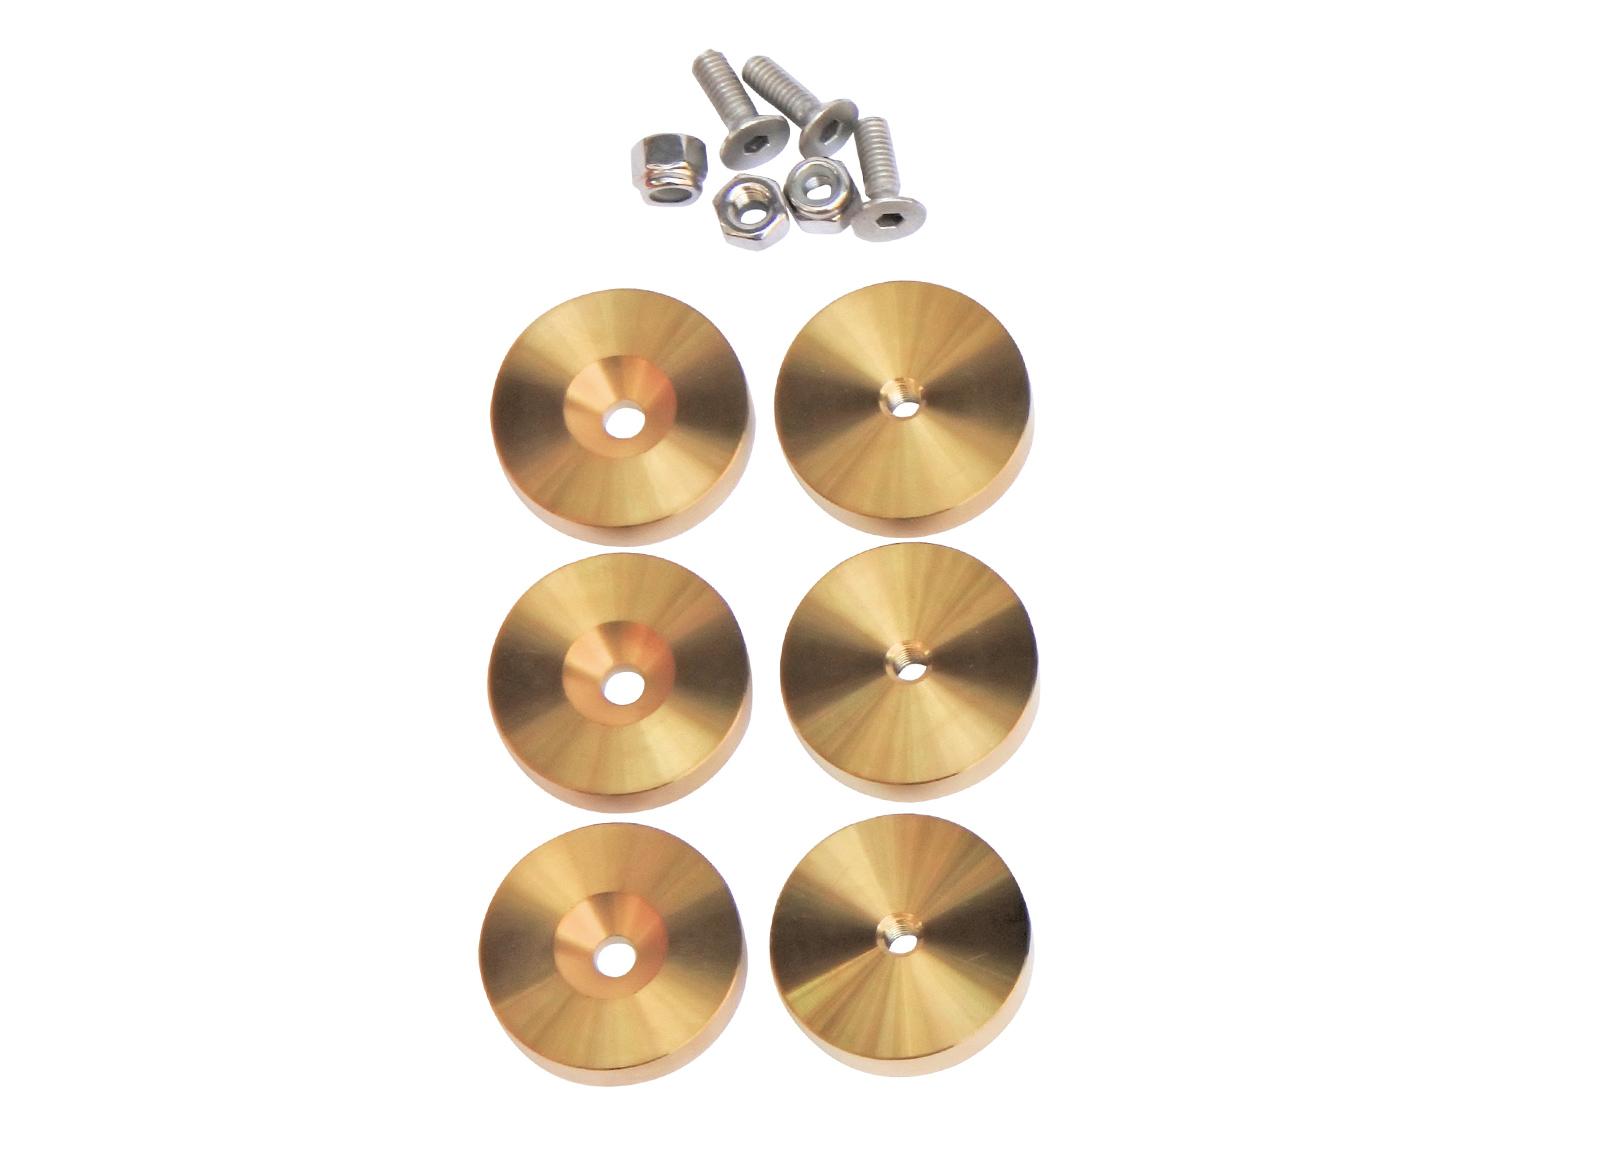 GILLO PESI PER RISER G1 STAINLES STEEL 6X25gr TITANIUM GOLD PLATED + VITI